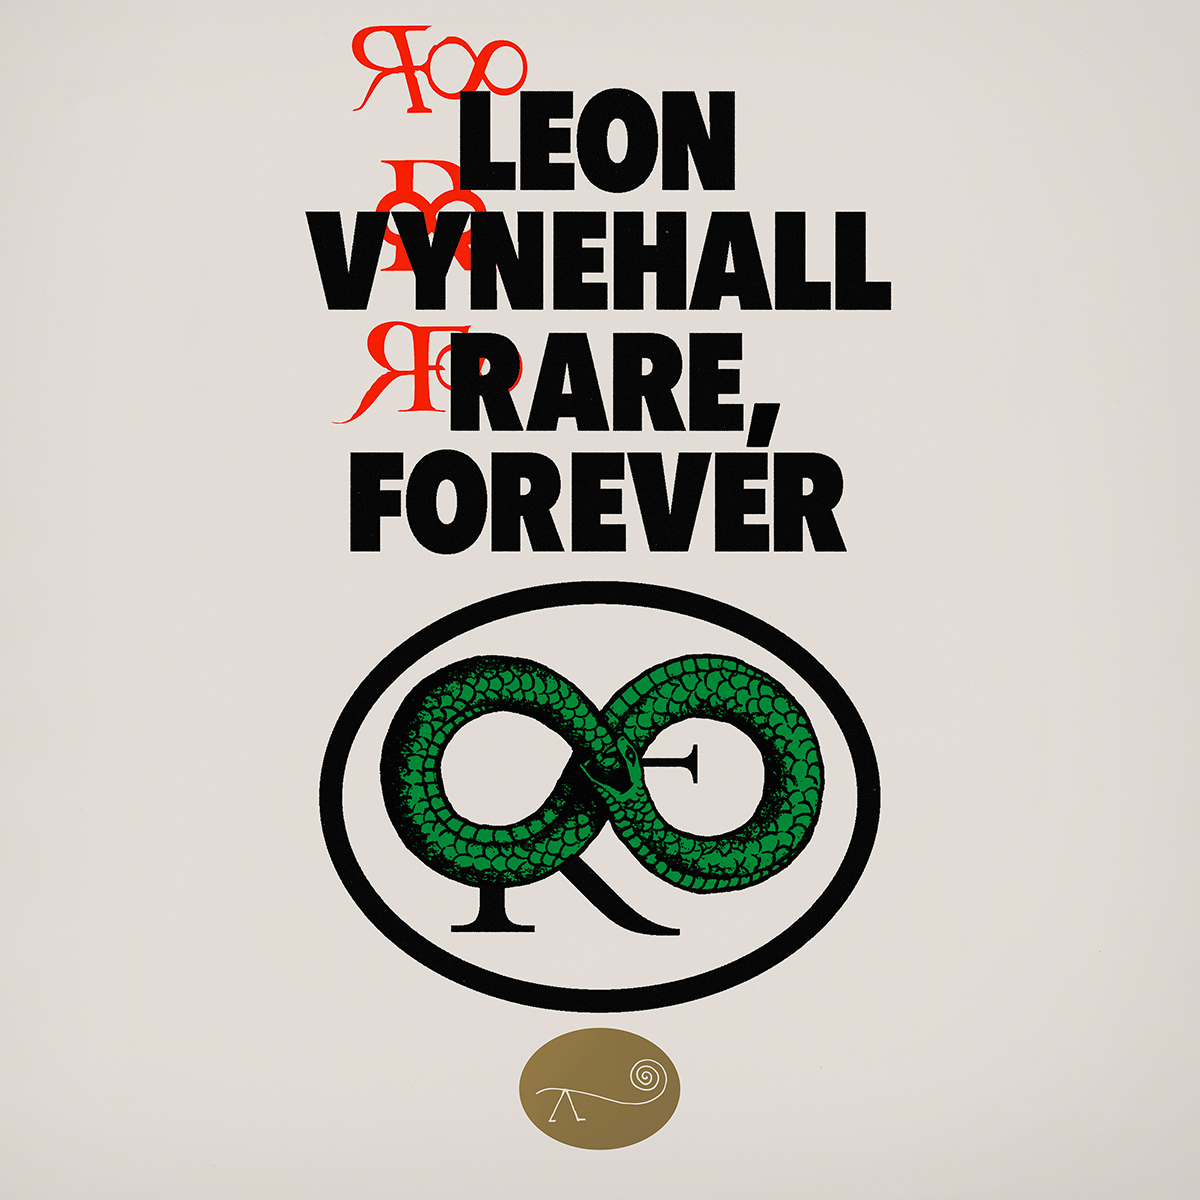 Leon-vynehall-ninja-tune